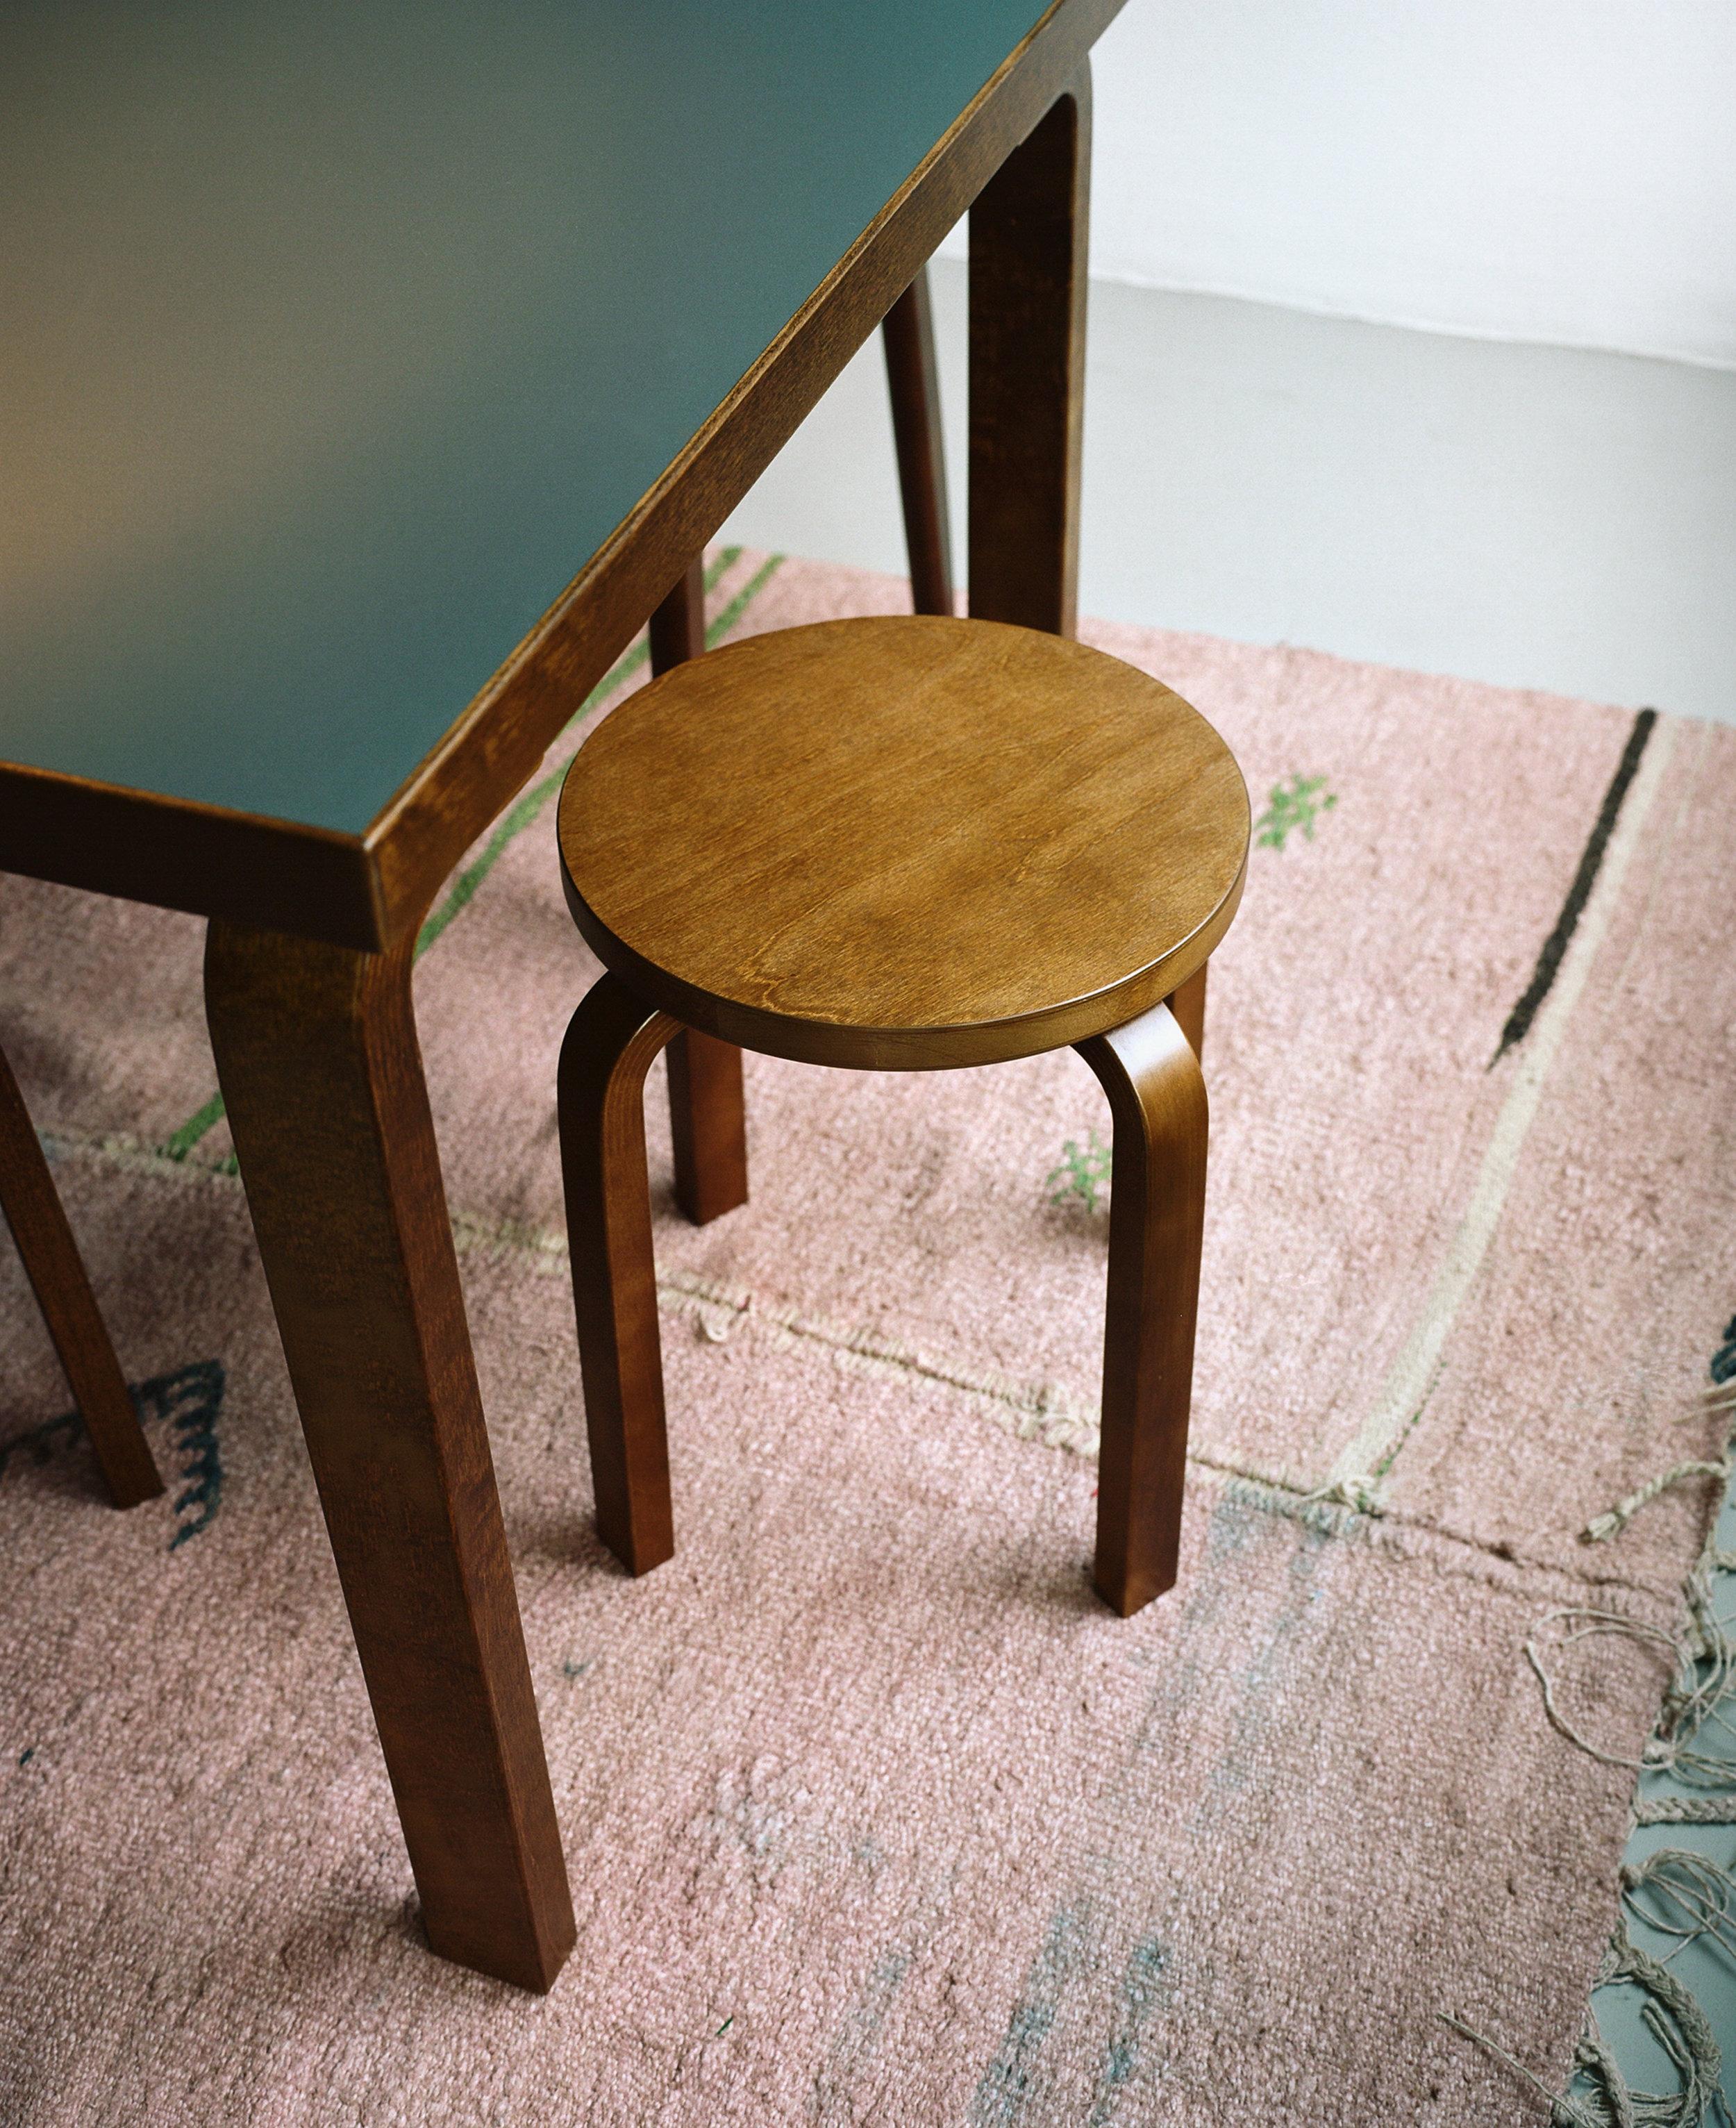 Aalto_Table_rectangular_Stool_E60_walnut_stained.jpg